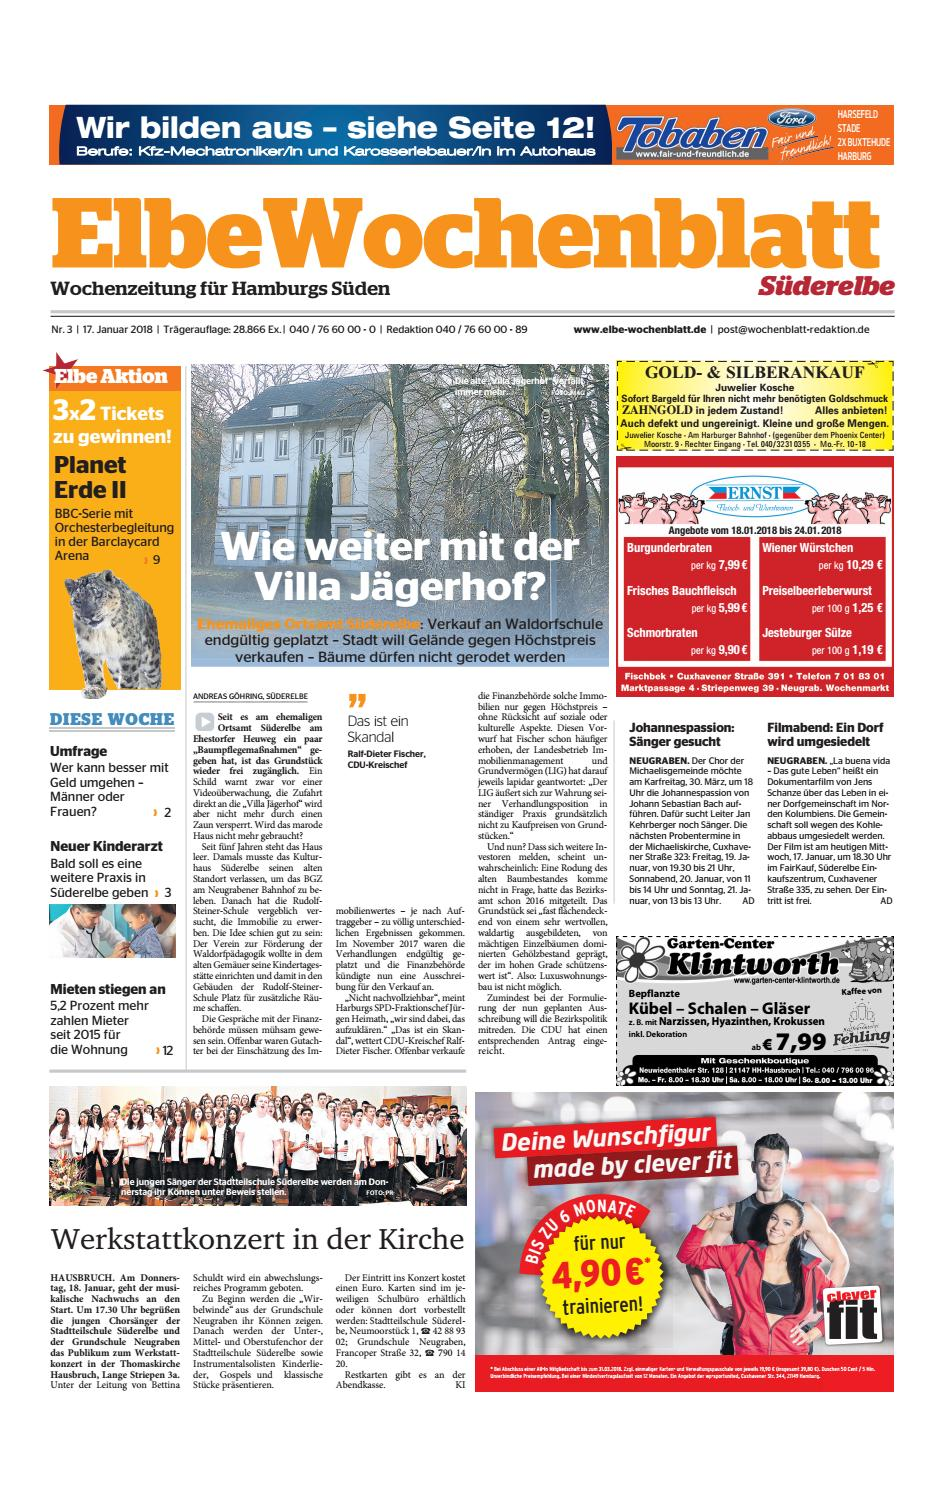 Süderelbe KW03 2018 by Elbe Wochenblatt Verlagsgesellschaft mbH & Co KG issuu